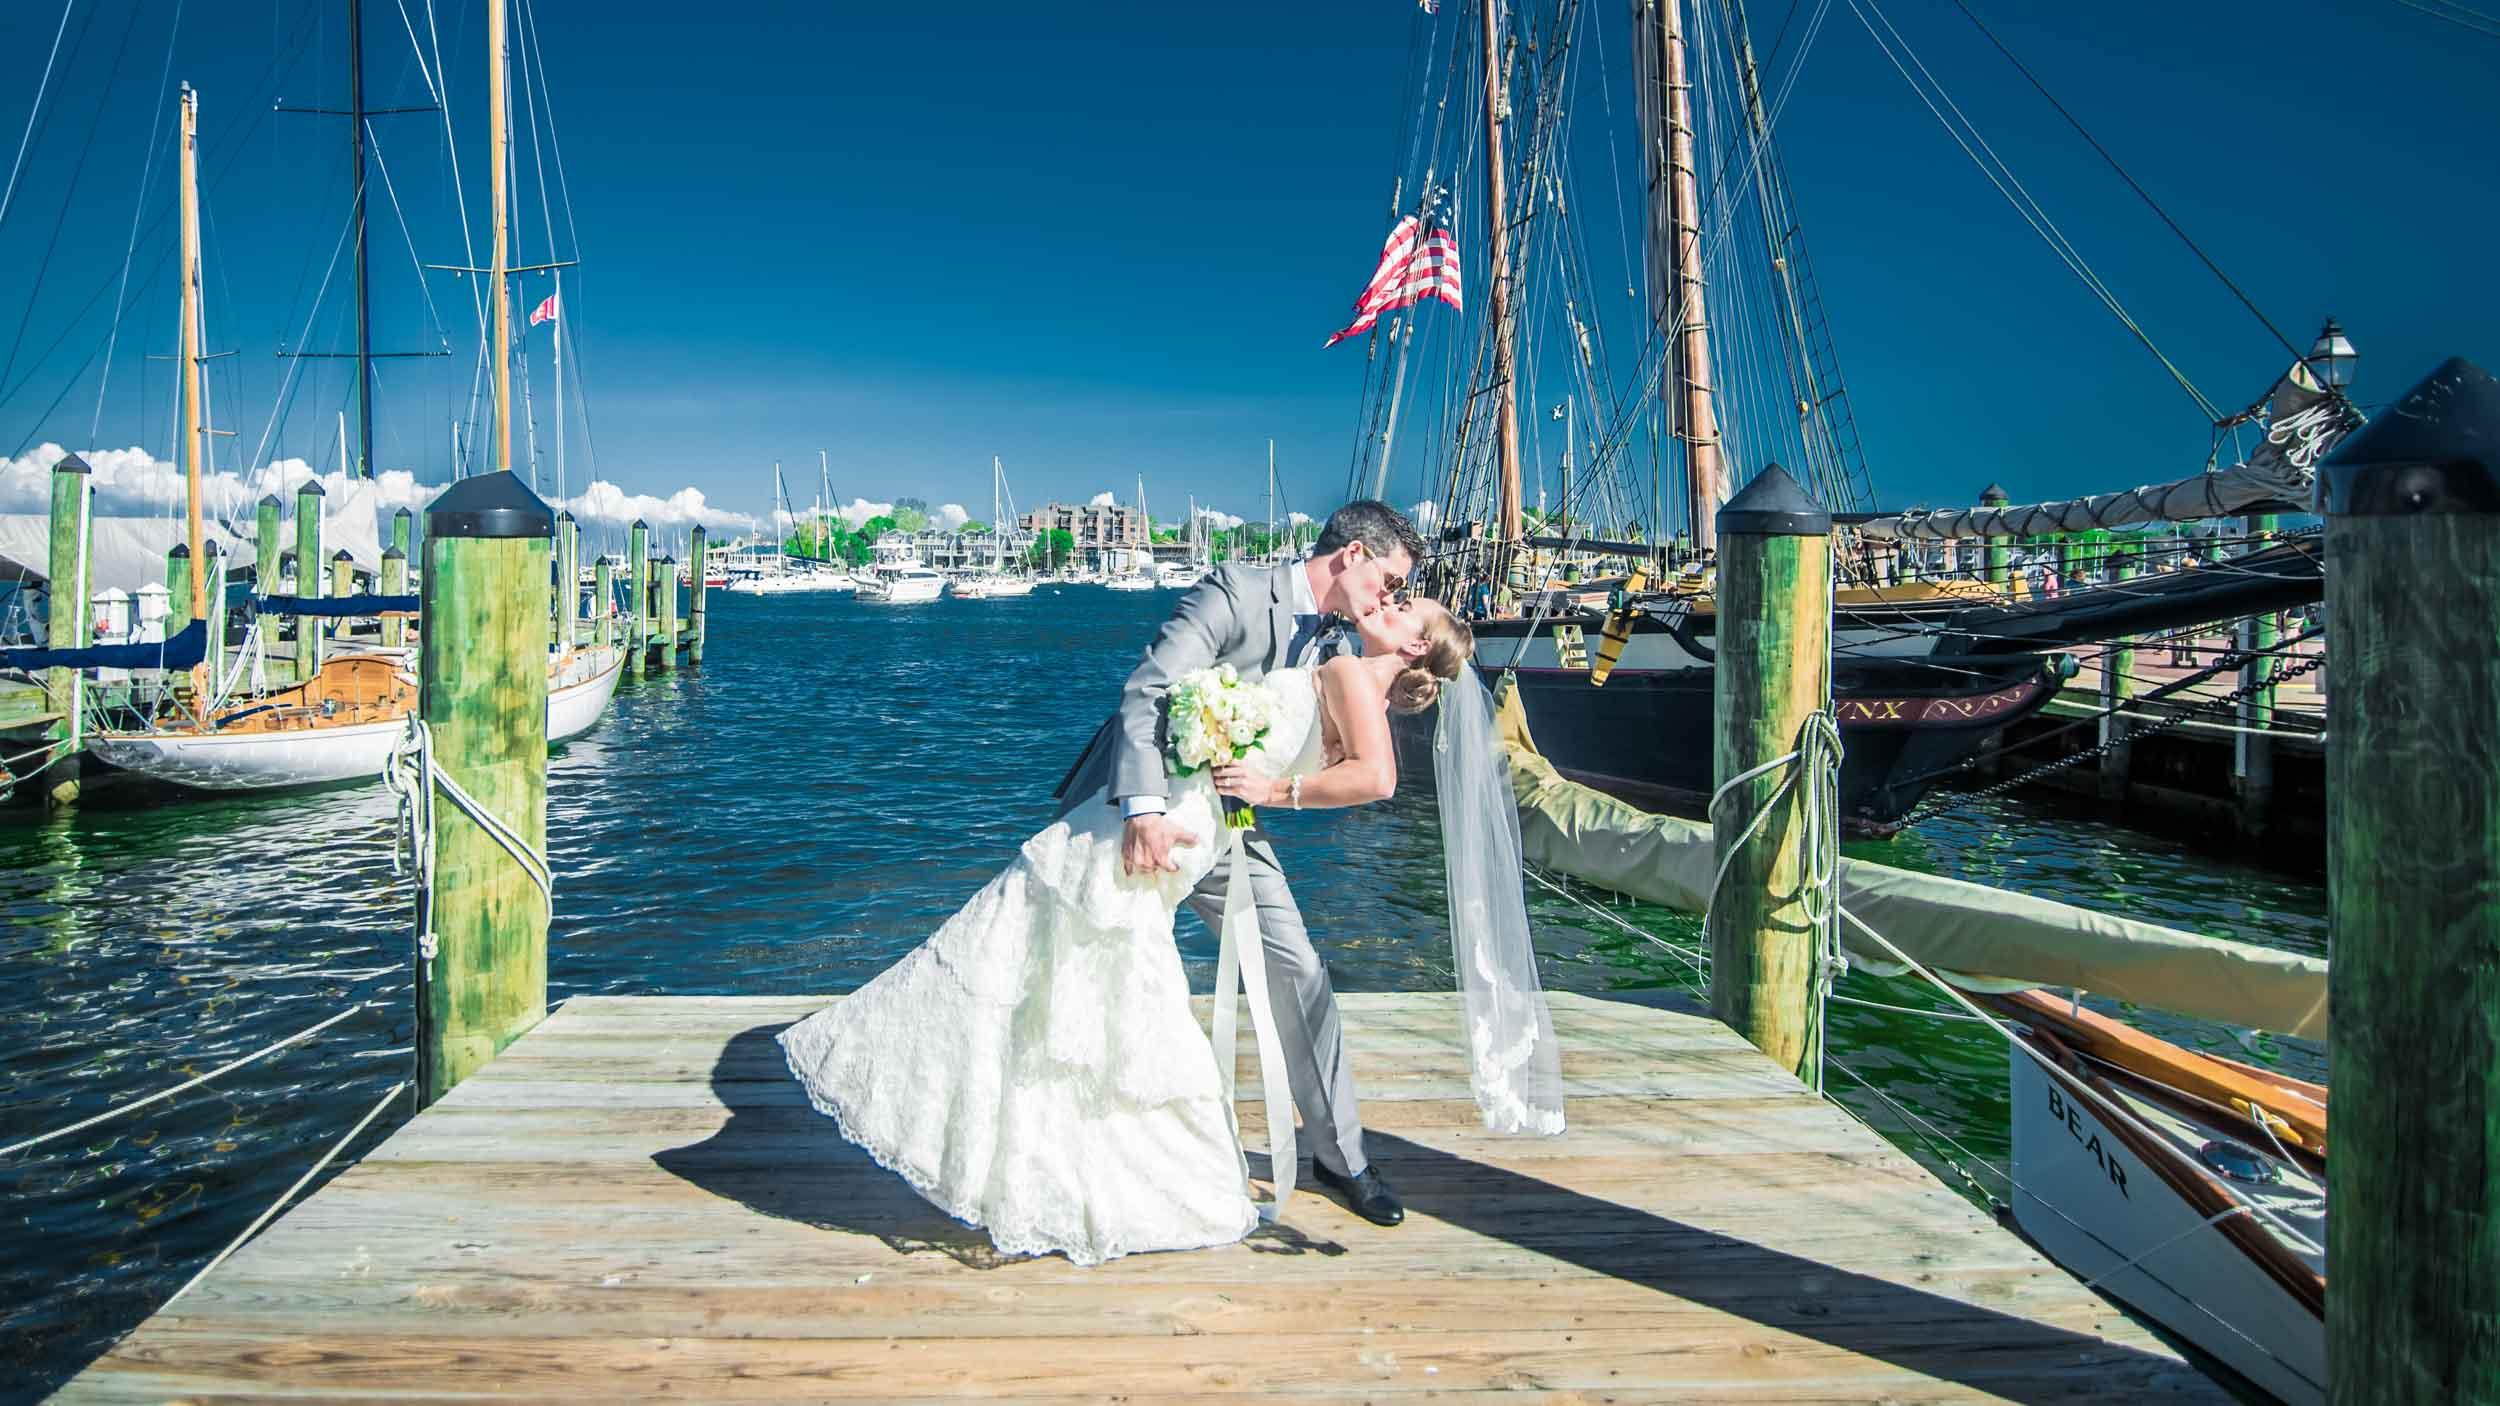 dc+metro+wedding+photographer+vadym+guliuk+photography+wedding+bride+and+groom-2024.jpg